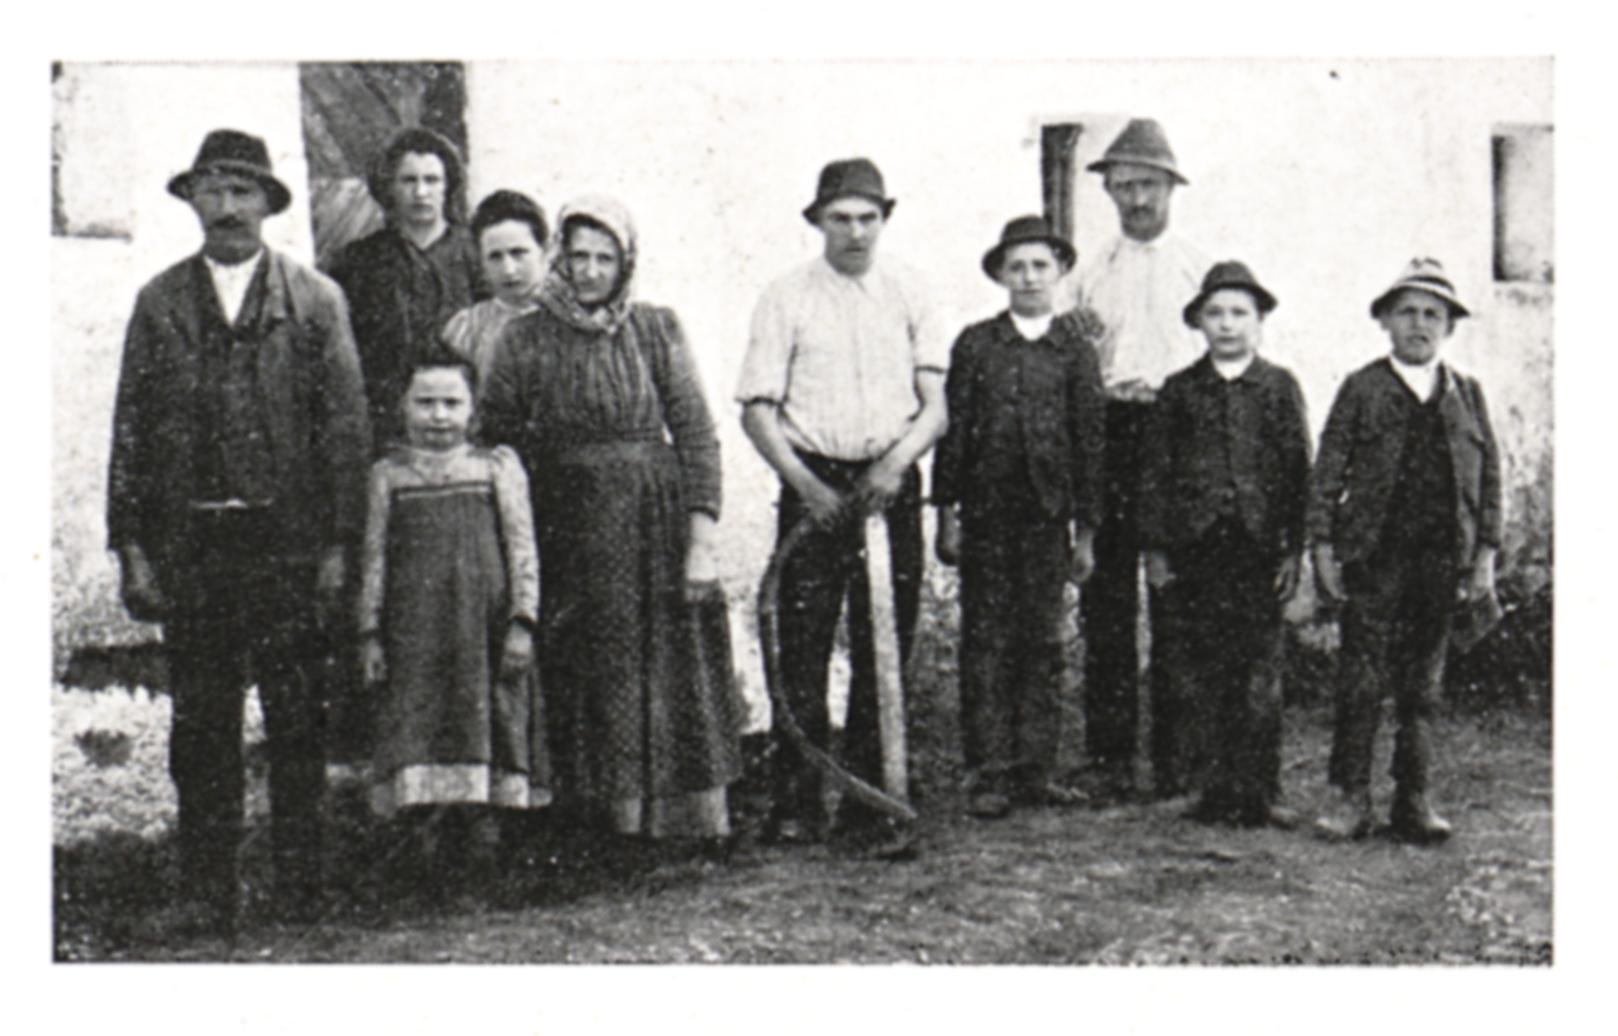 https://upload.wikimedia.org/wikipedia/commons/b/b2/044_Bauern_in_Hall_bei_Admont_im_Arbeitsgewand_-_1920.jpg